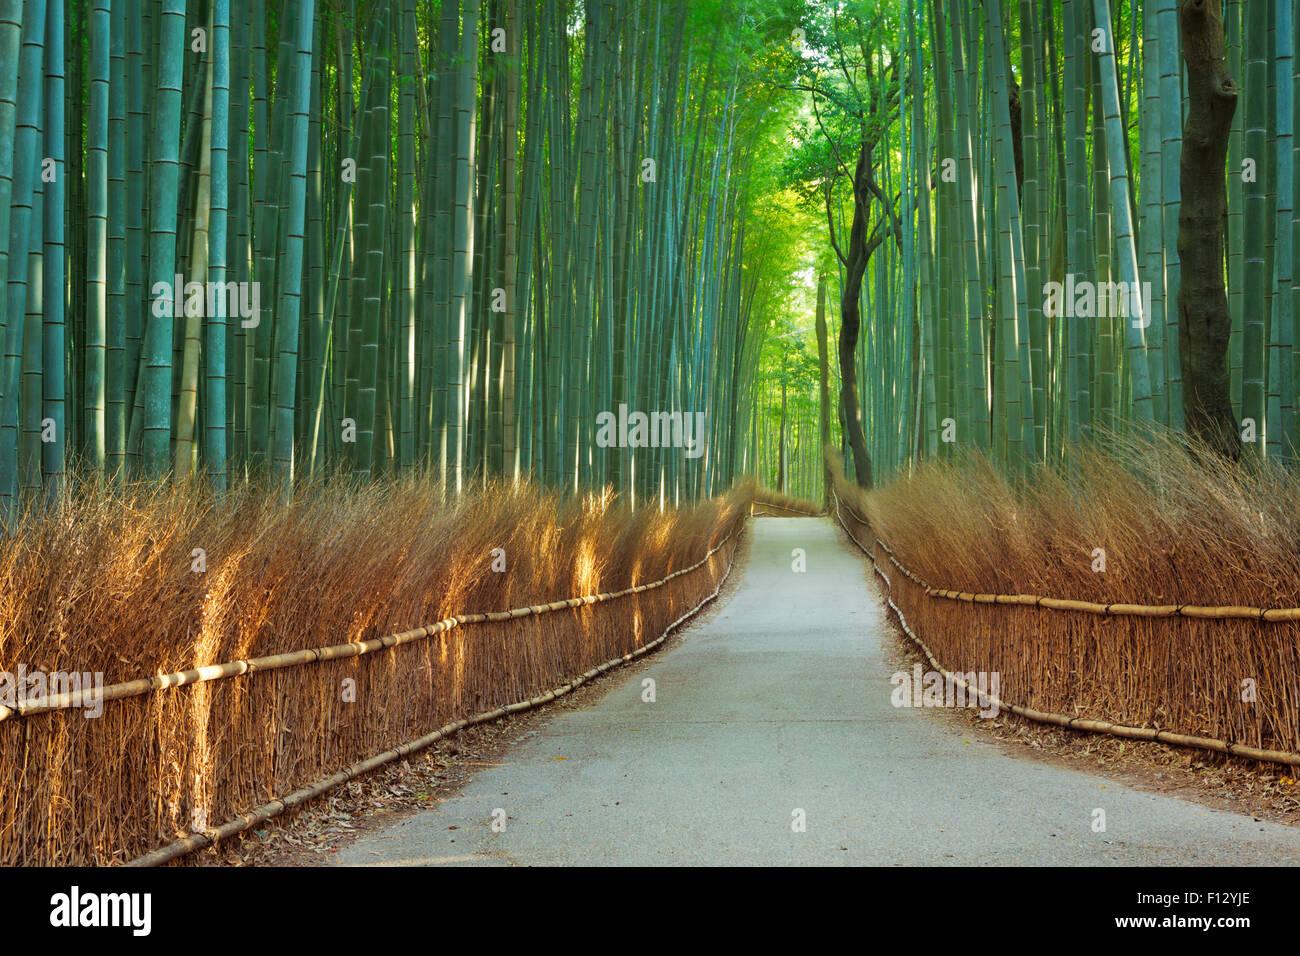 Un camino a través de un bosque de bambú. Fotografiado en el Arashiyama de bambú cerca de Kyoto, Imagen De Stock